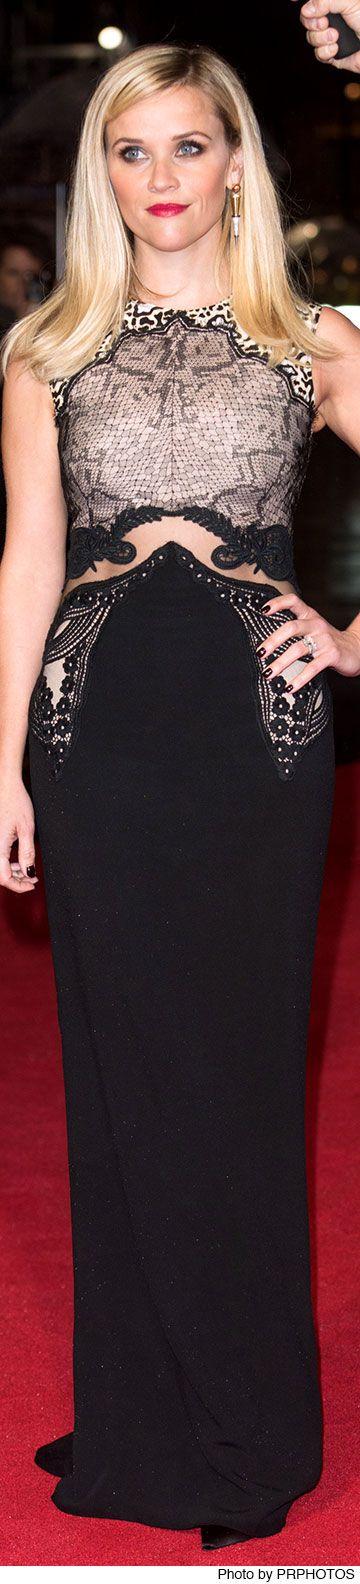 Reese Witherspoon Wearing Stella McCartney dress and Jessica McCormack earrings -  2014 BFI London Film Festival - Wild Gala Screening